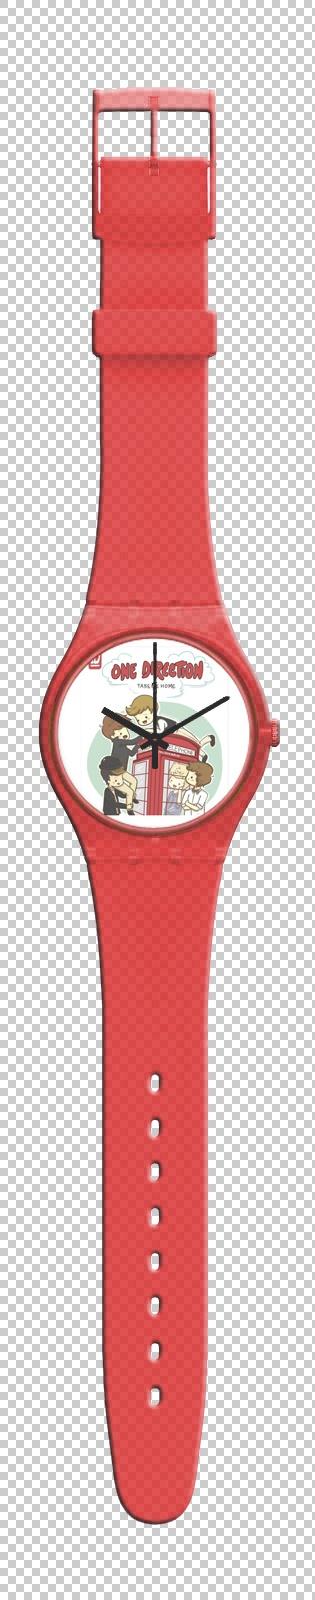 One Direction Wrist Watch : Take Me Home Series. IDR 85,000 Pilihan tali transparan : merah,pink,ungu, Tali Stripes : merah,pink,hitam,biru,kuning,ungu. Tali kulit : hitam, coklat tua, coklat muda.